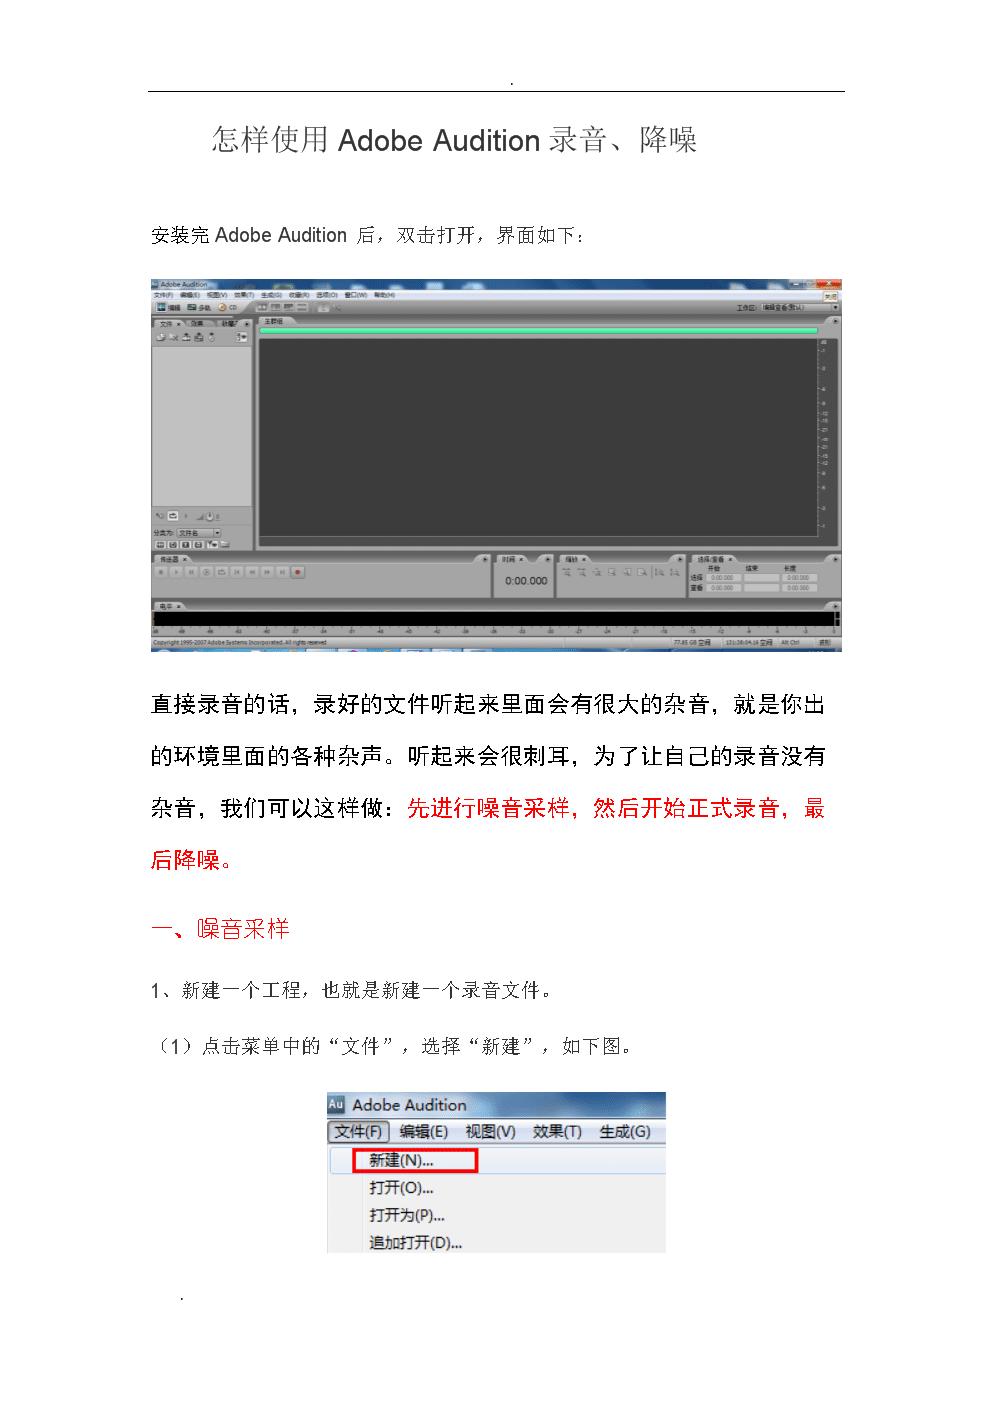 怎样使用Adobe Audition录音.doc